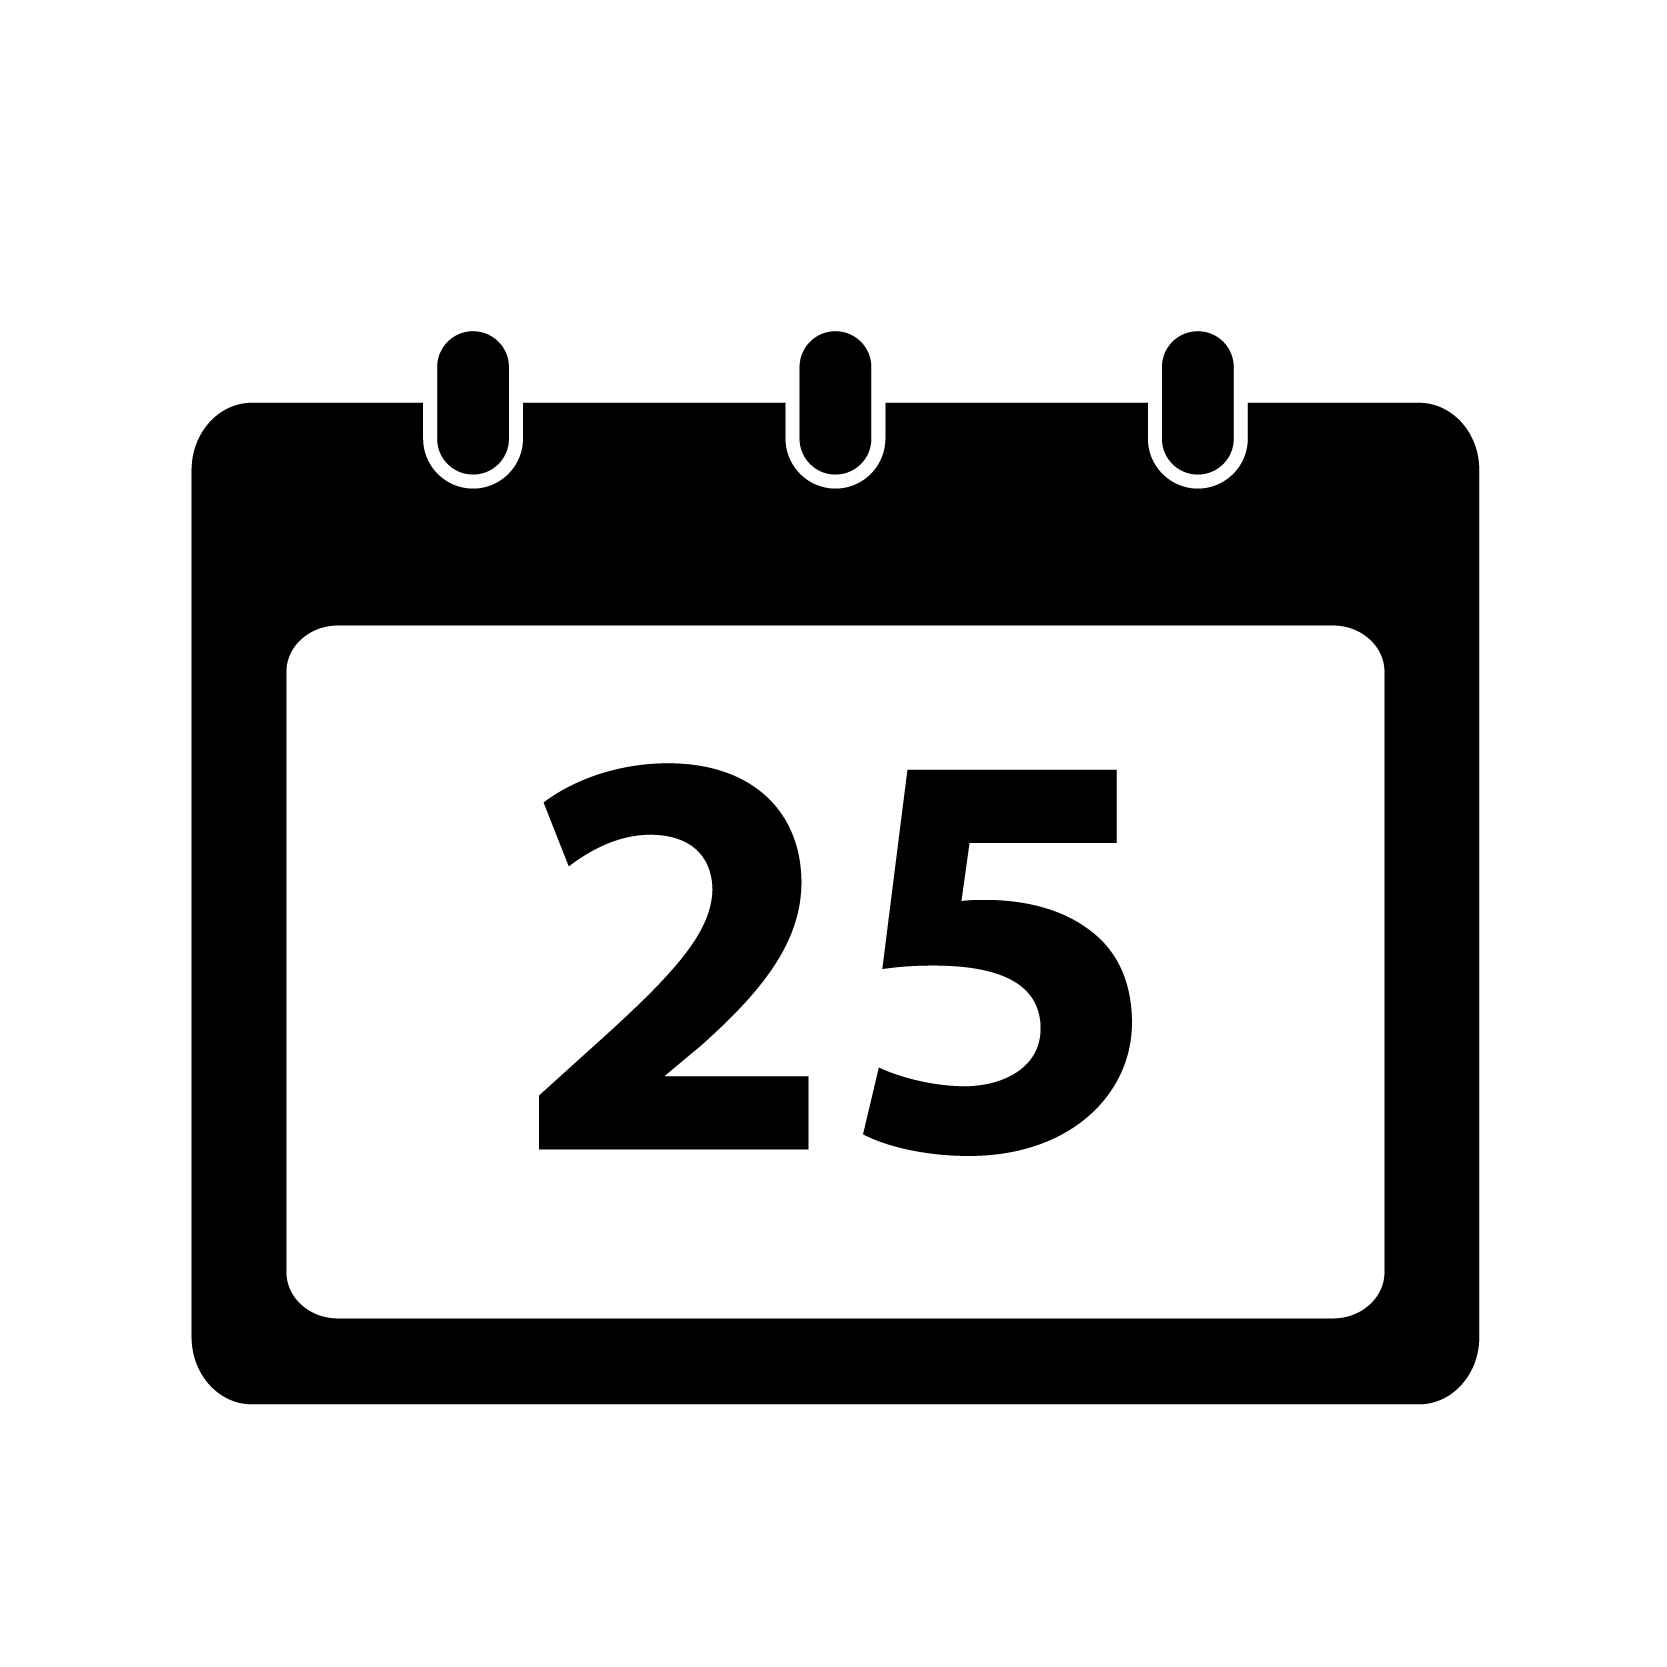 iconos-wayco-06.png